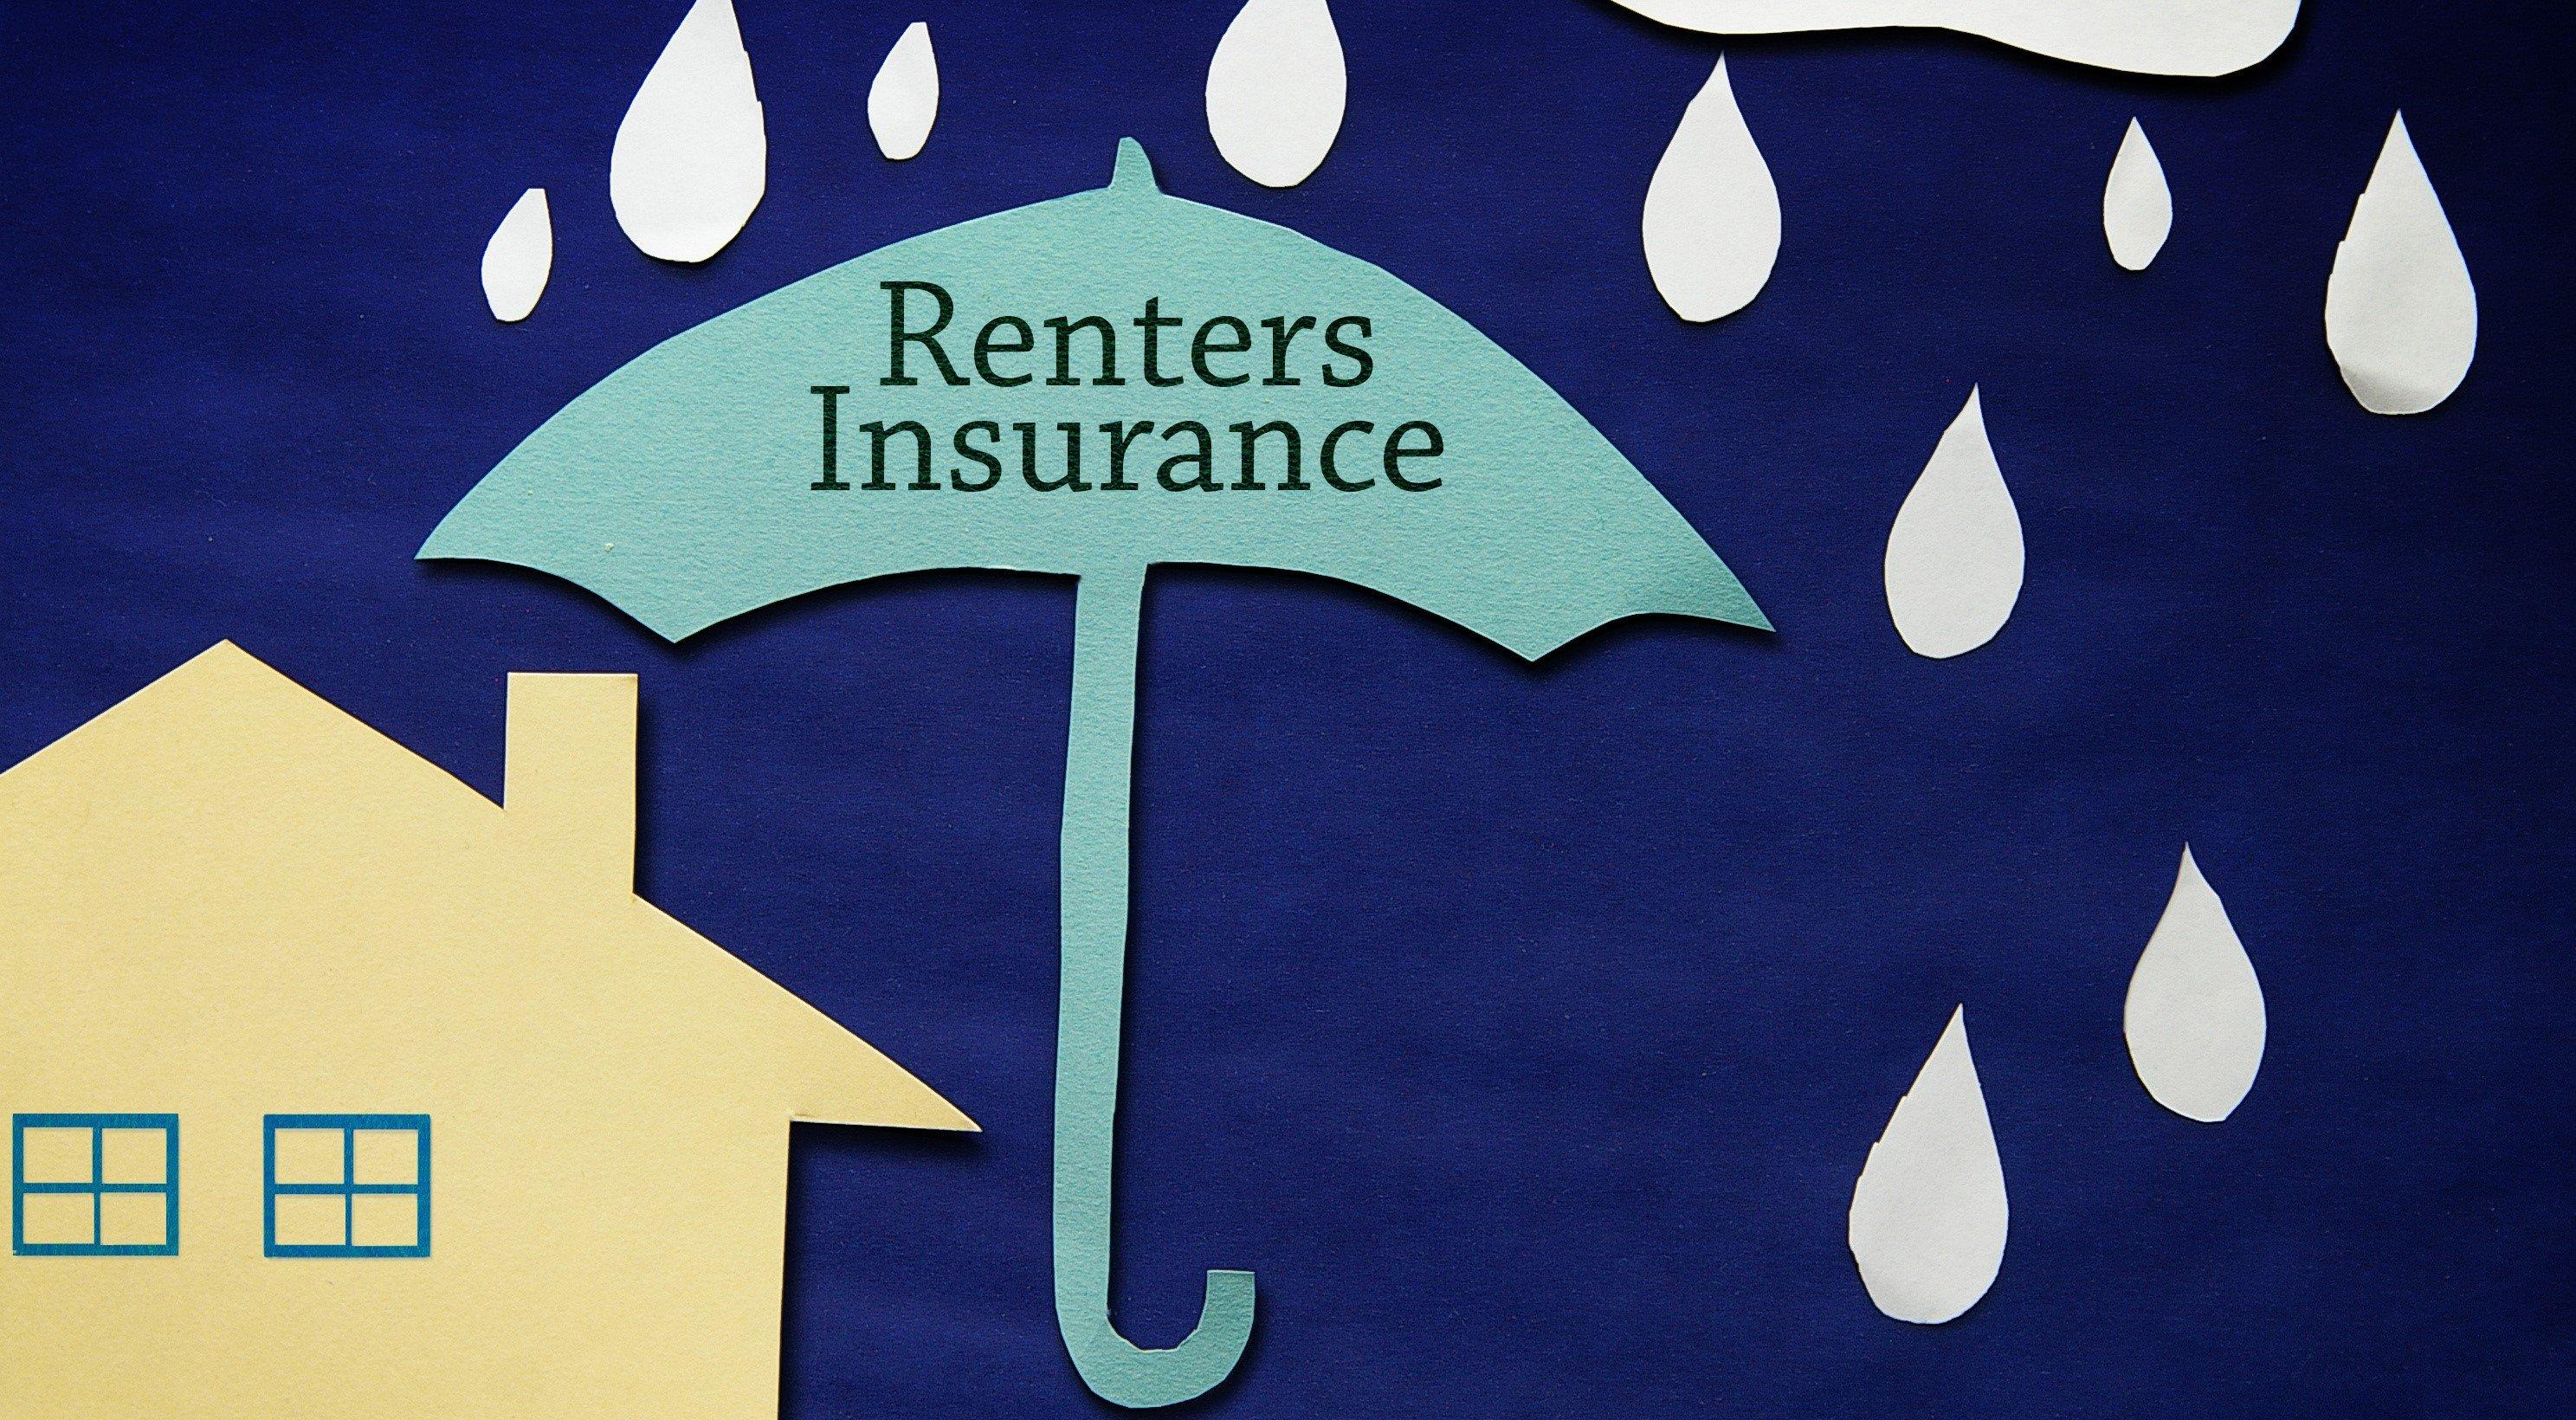 NH renters insurance